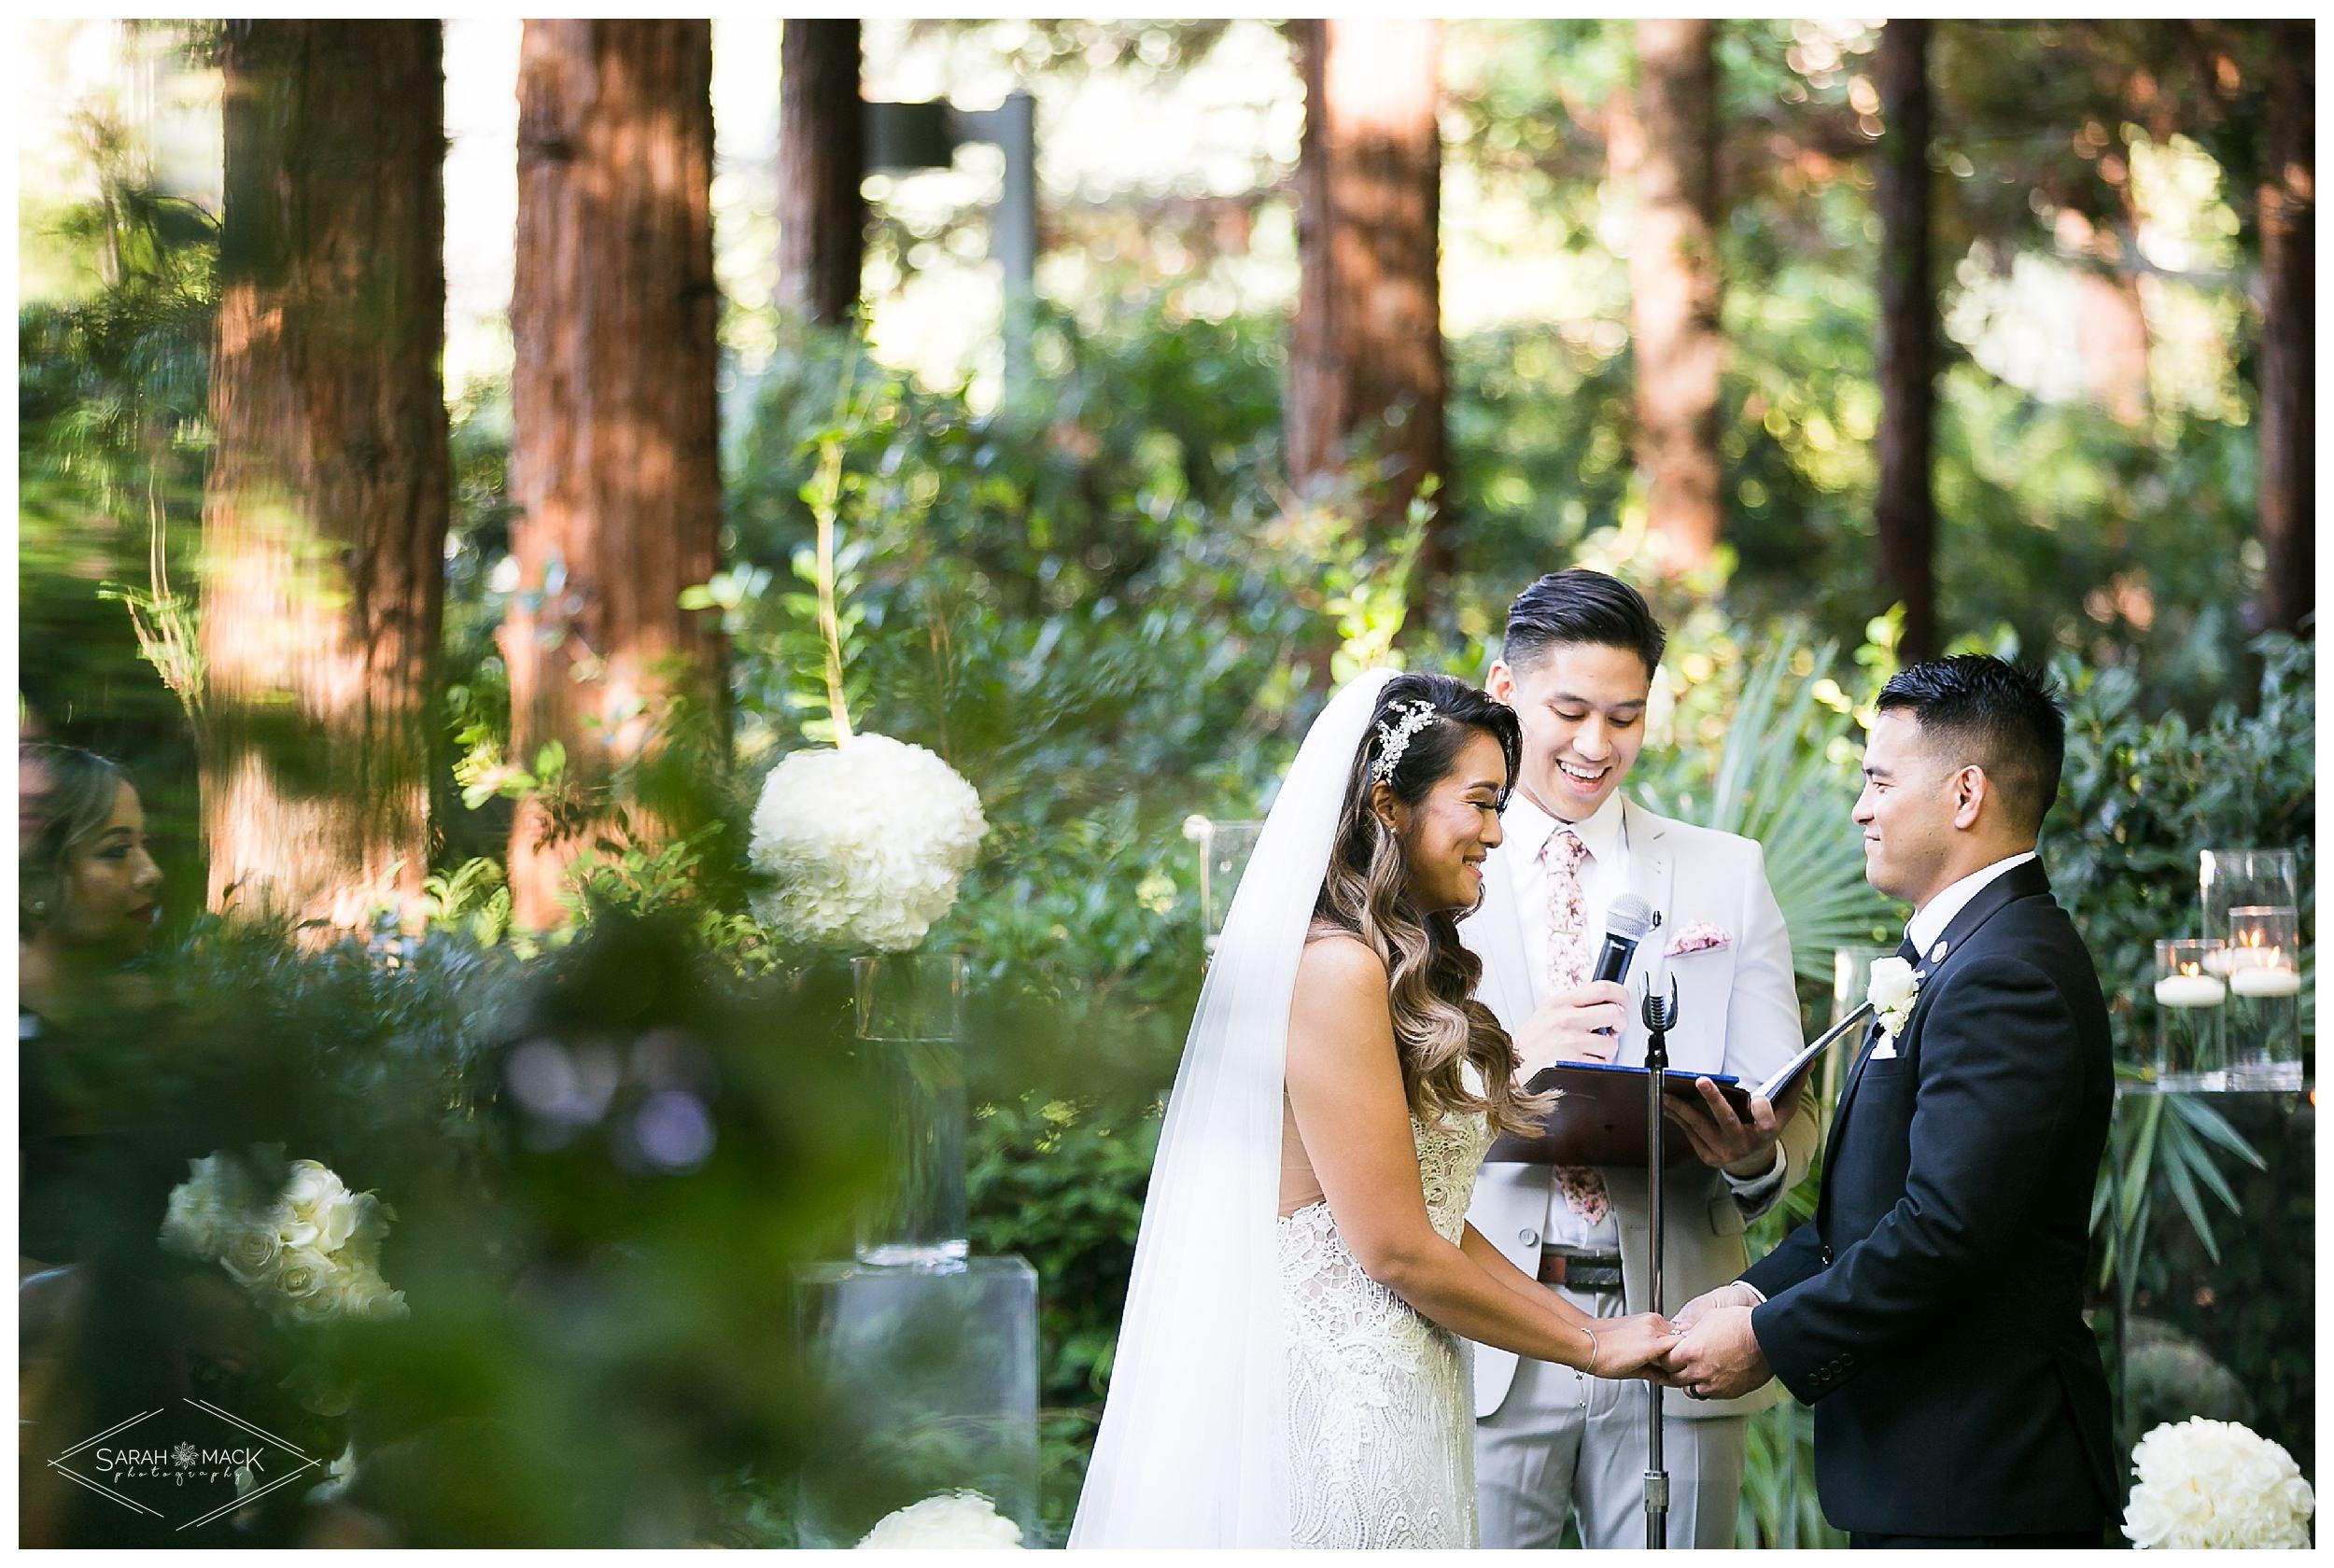 LE-Avenue-of-the-Arts-Costa-Mesa-Wedding-Photography-0154.jpg